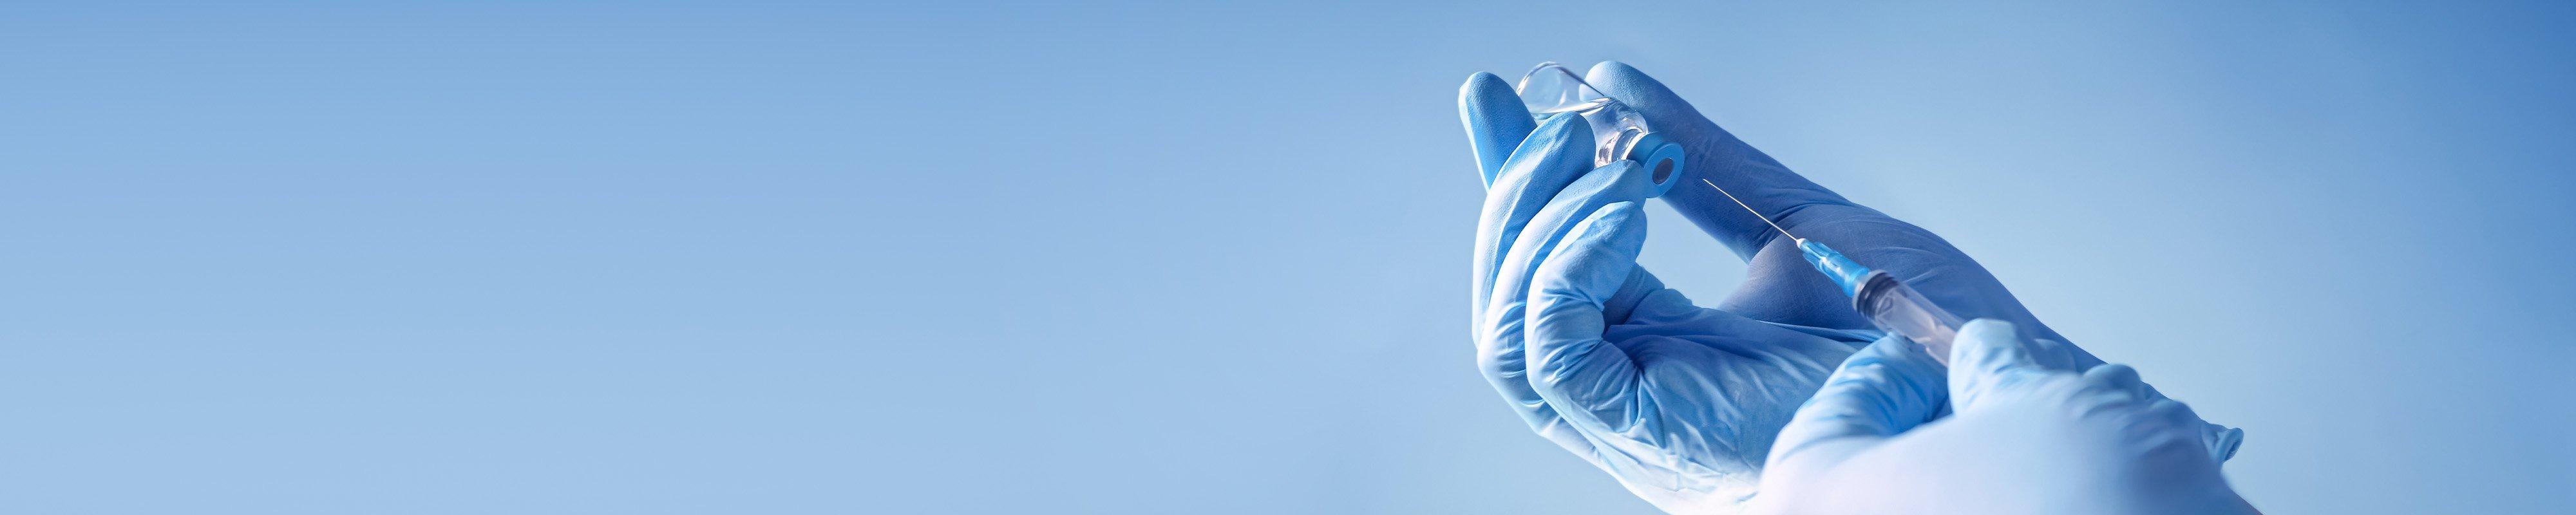 VV-Manditory Vaccinations - Blog banner-4000x800